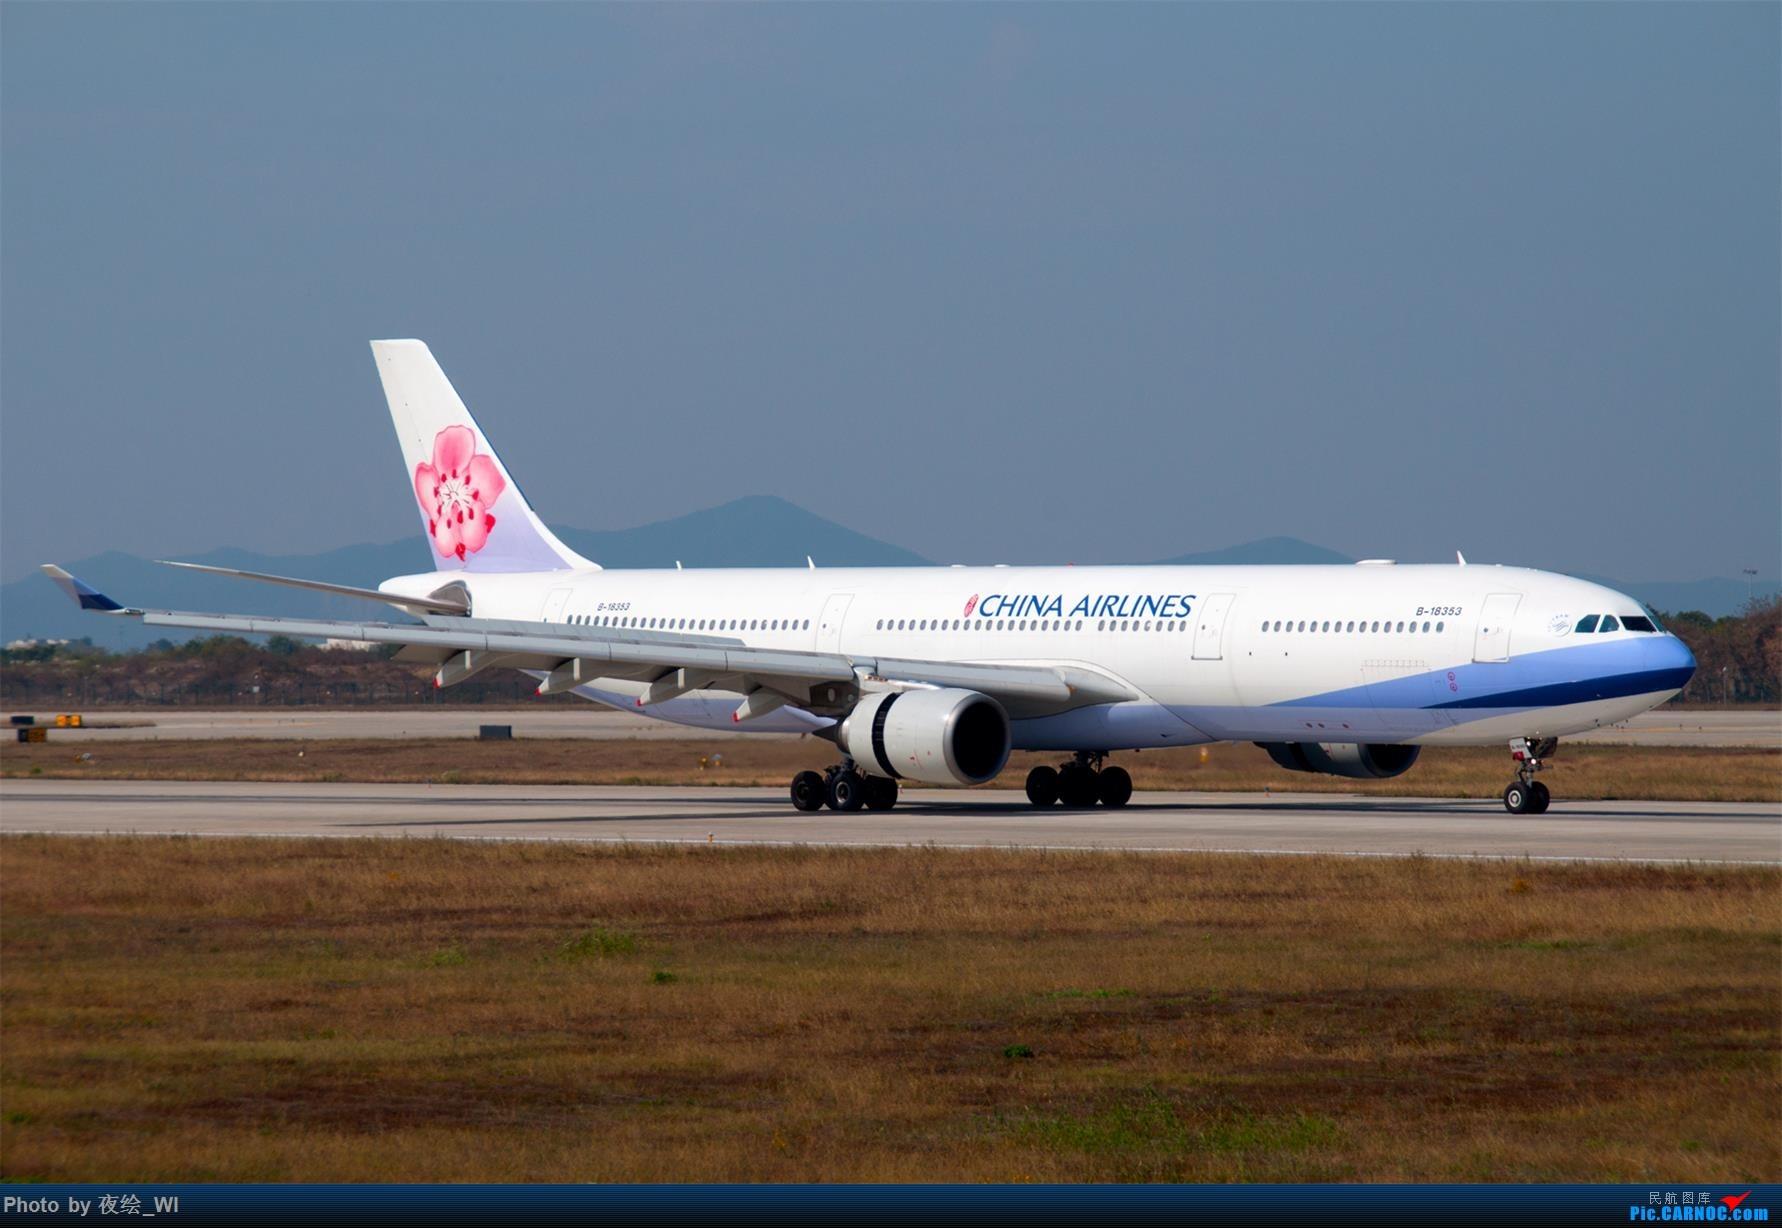 Re:[原创]【NKG】1800*1200,周末随便拍,意外等到好货 AIRBUS A330-300 B-18353 中国南京禄口国际机场